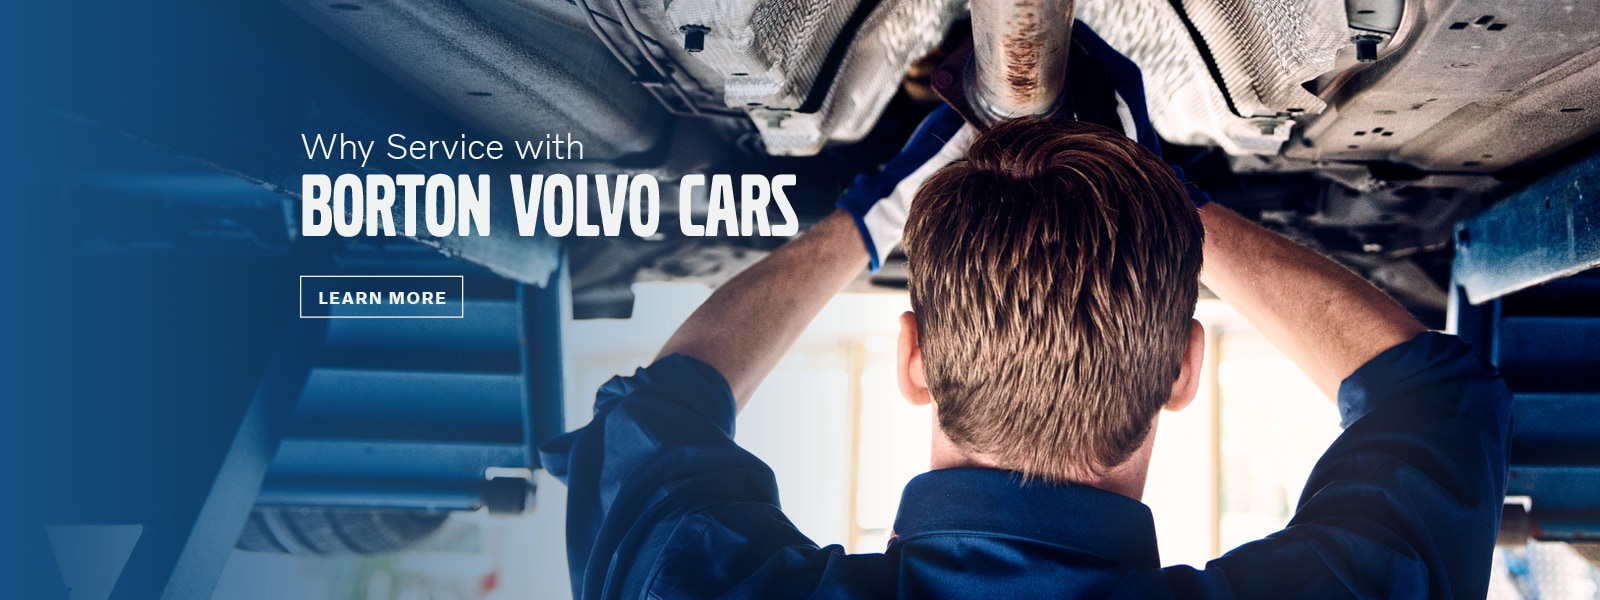 borton volvo cars | golden valley, mn | new & used volvo dealership